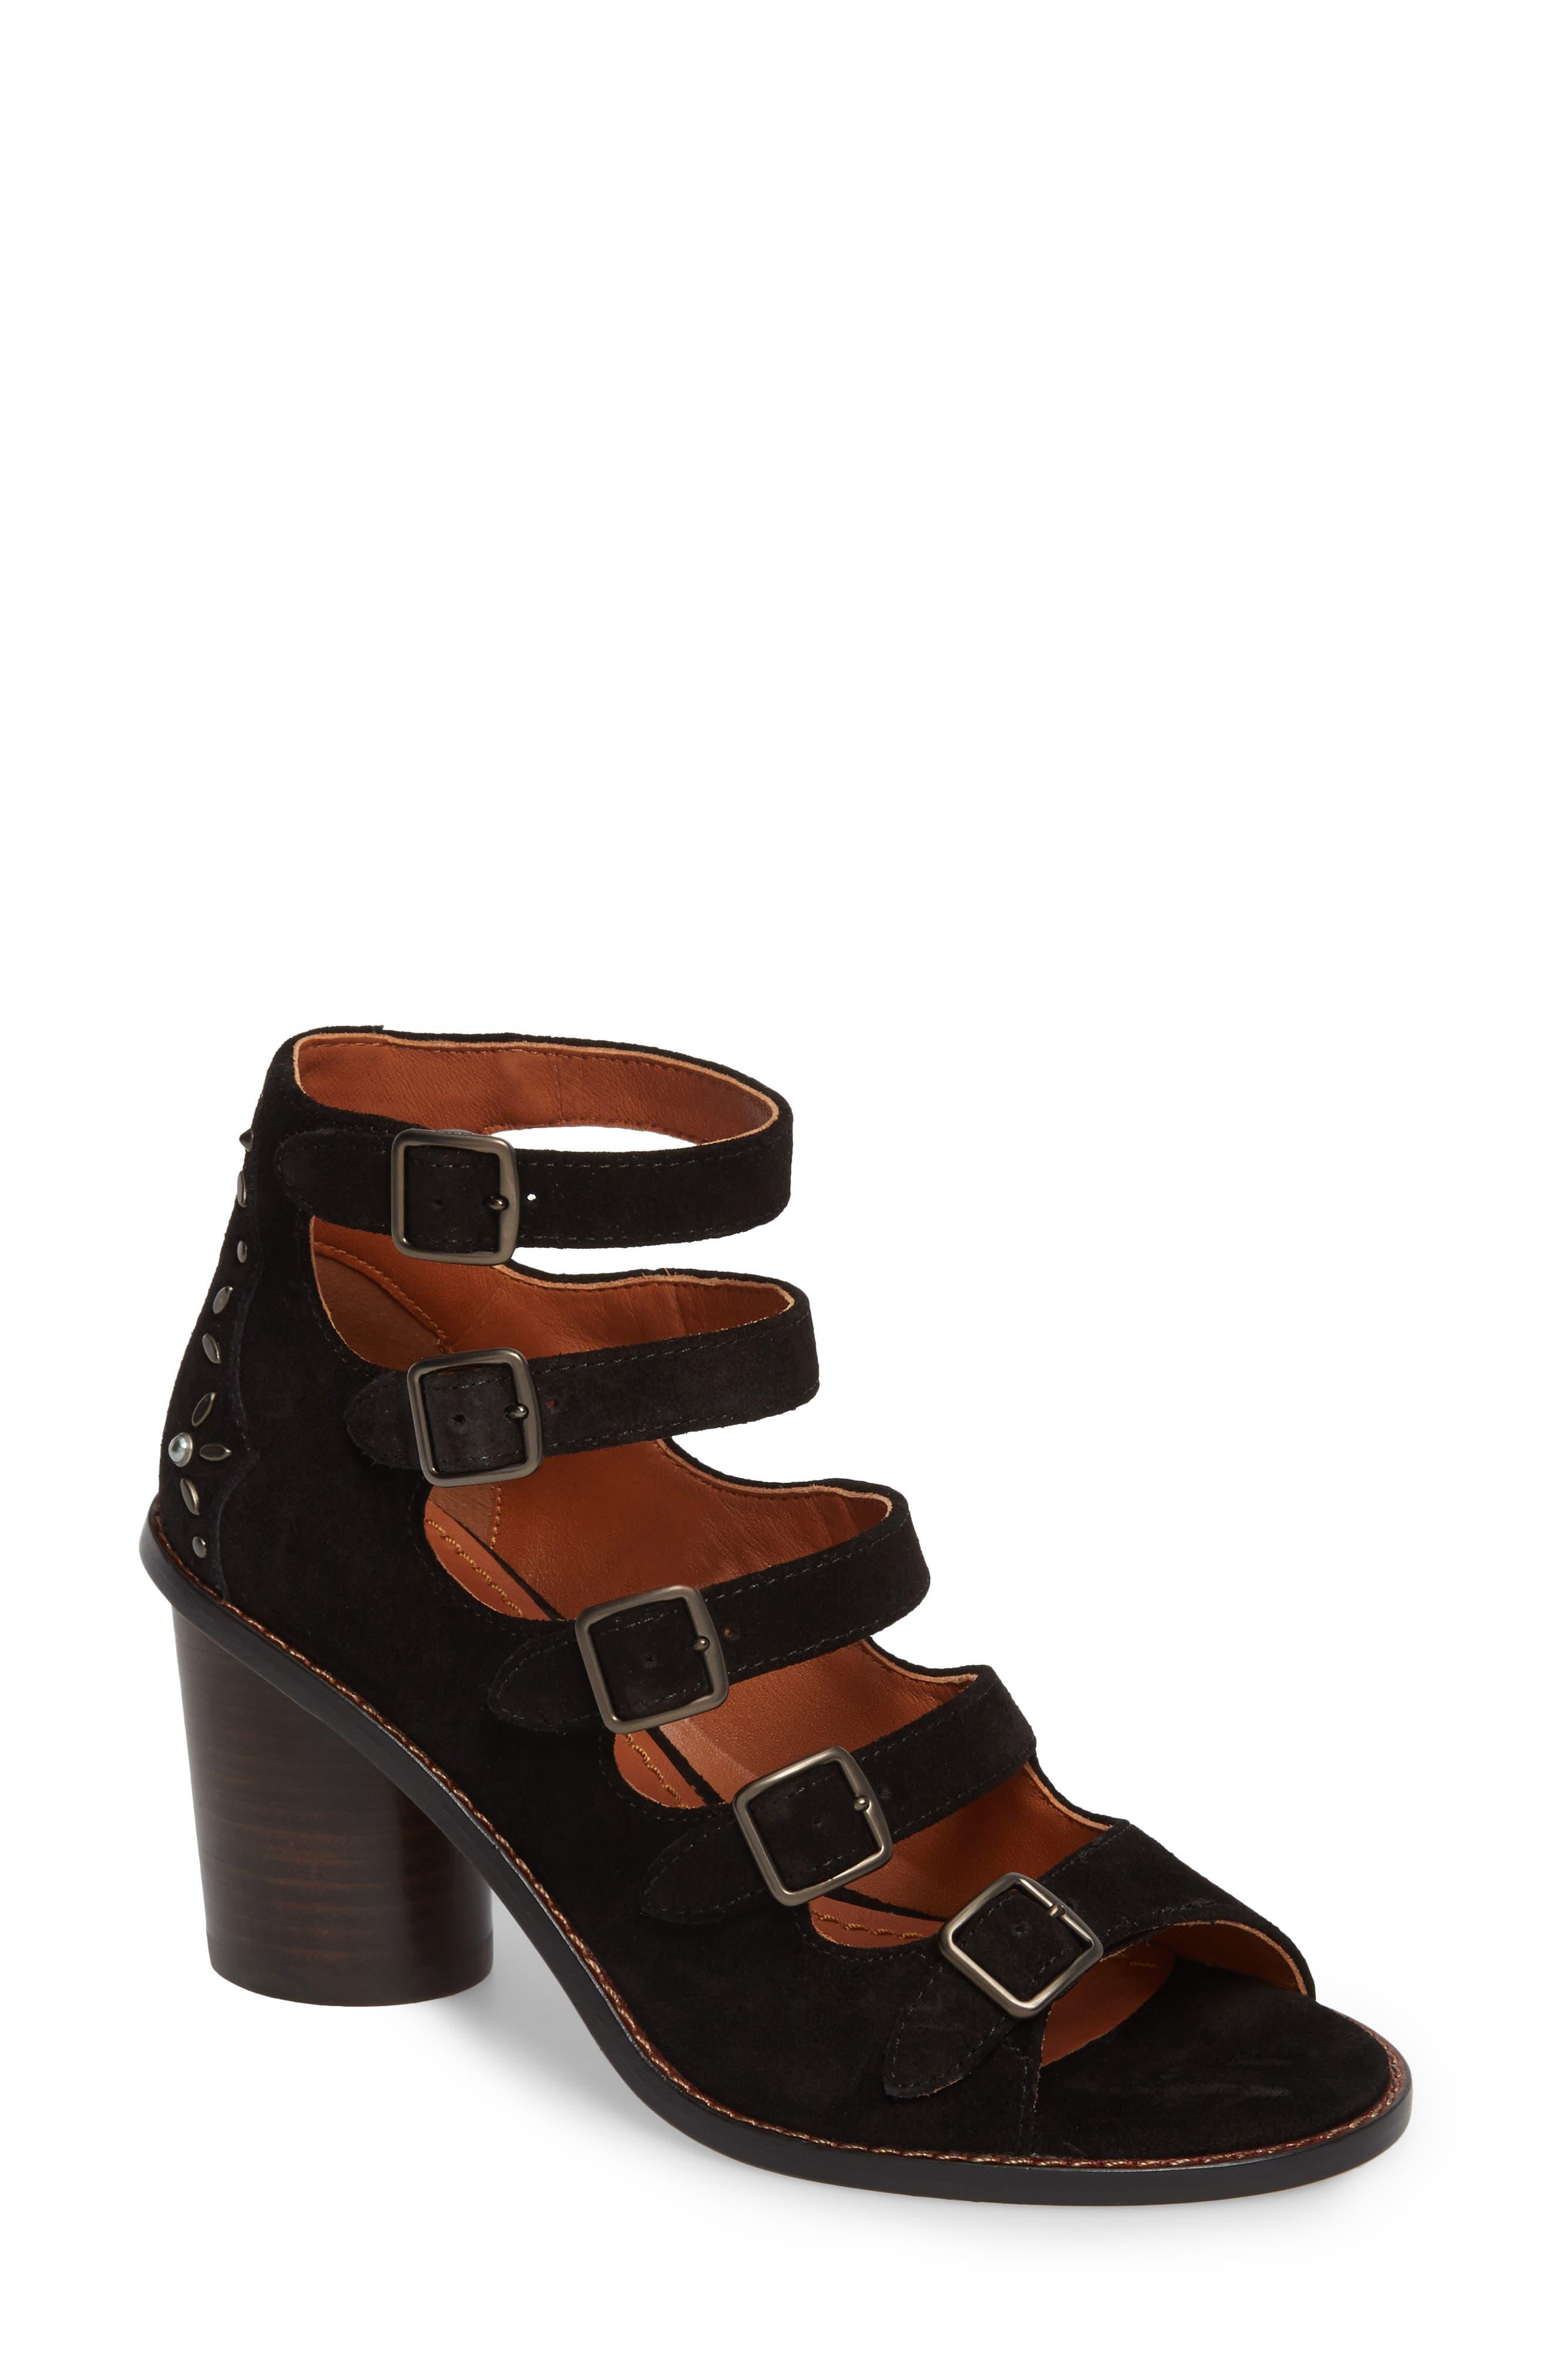 Prairie Rivet Buckle Sandal,                         Main,                         color, Black Suede